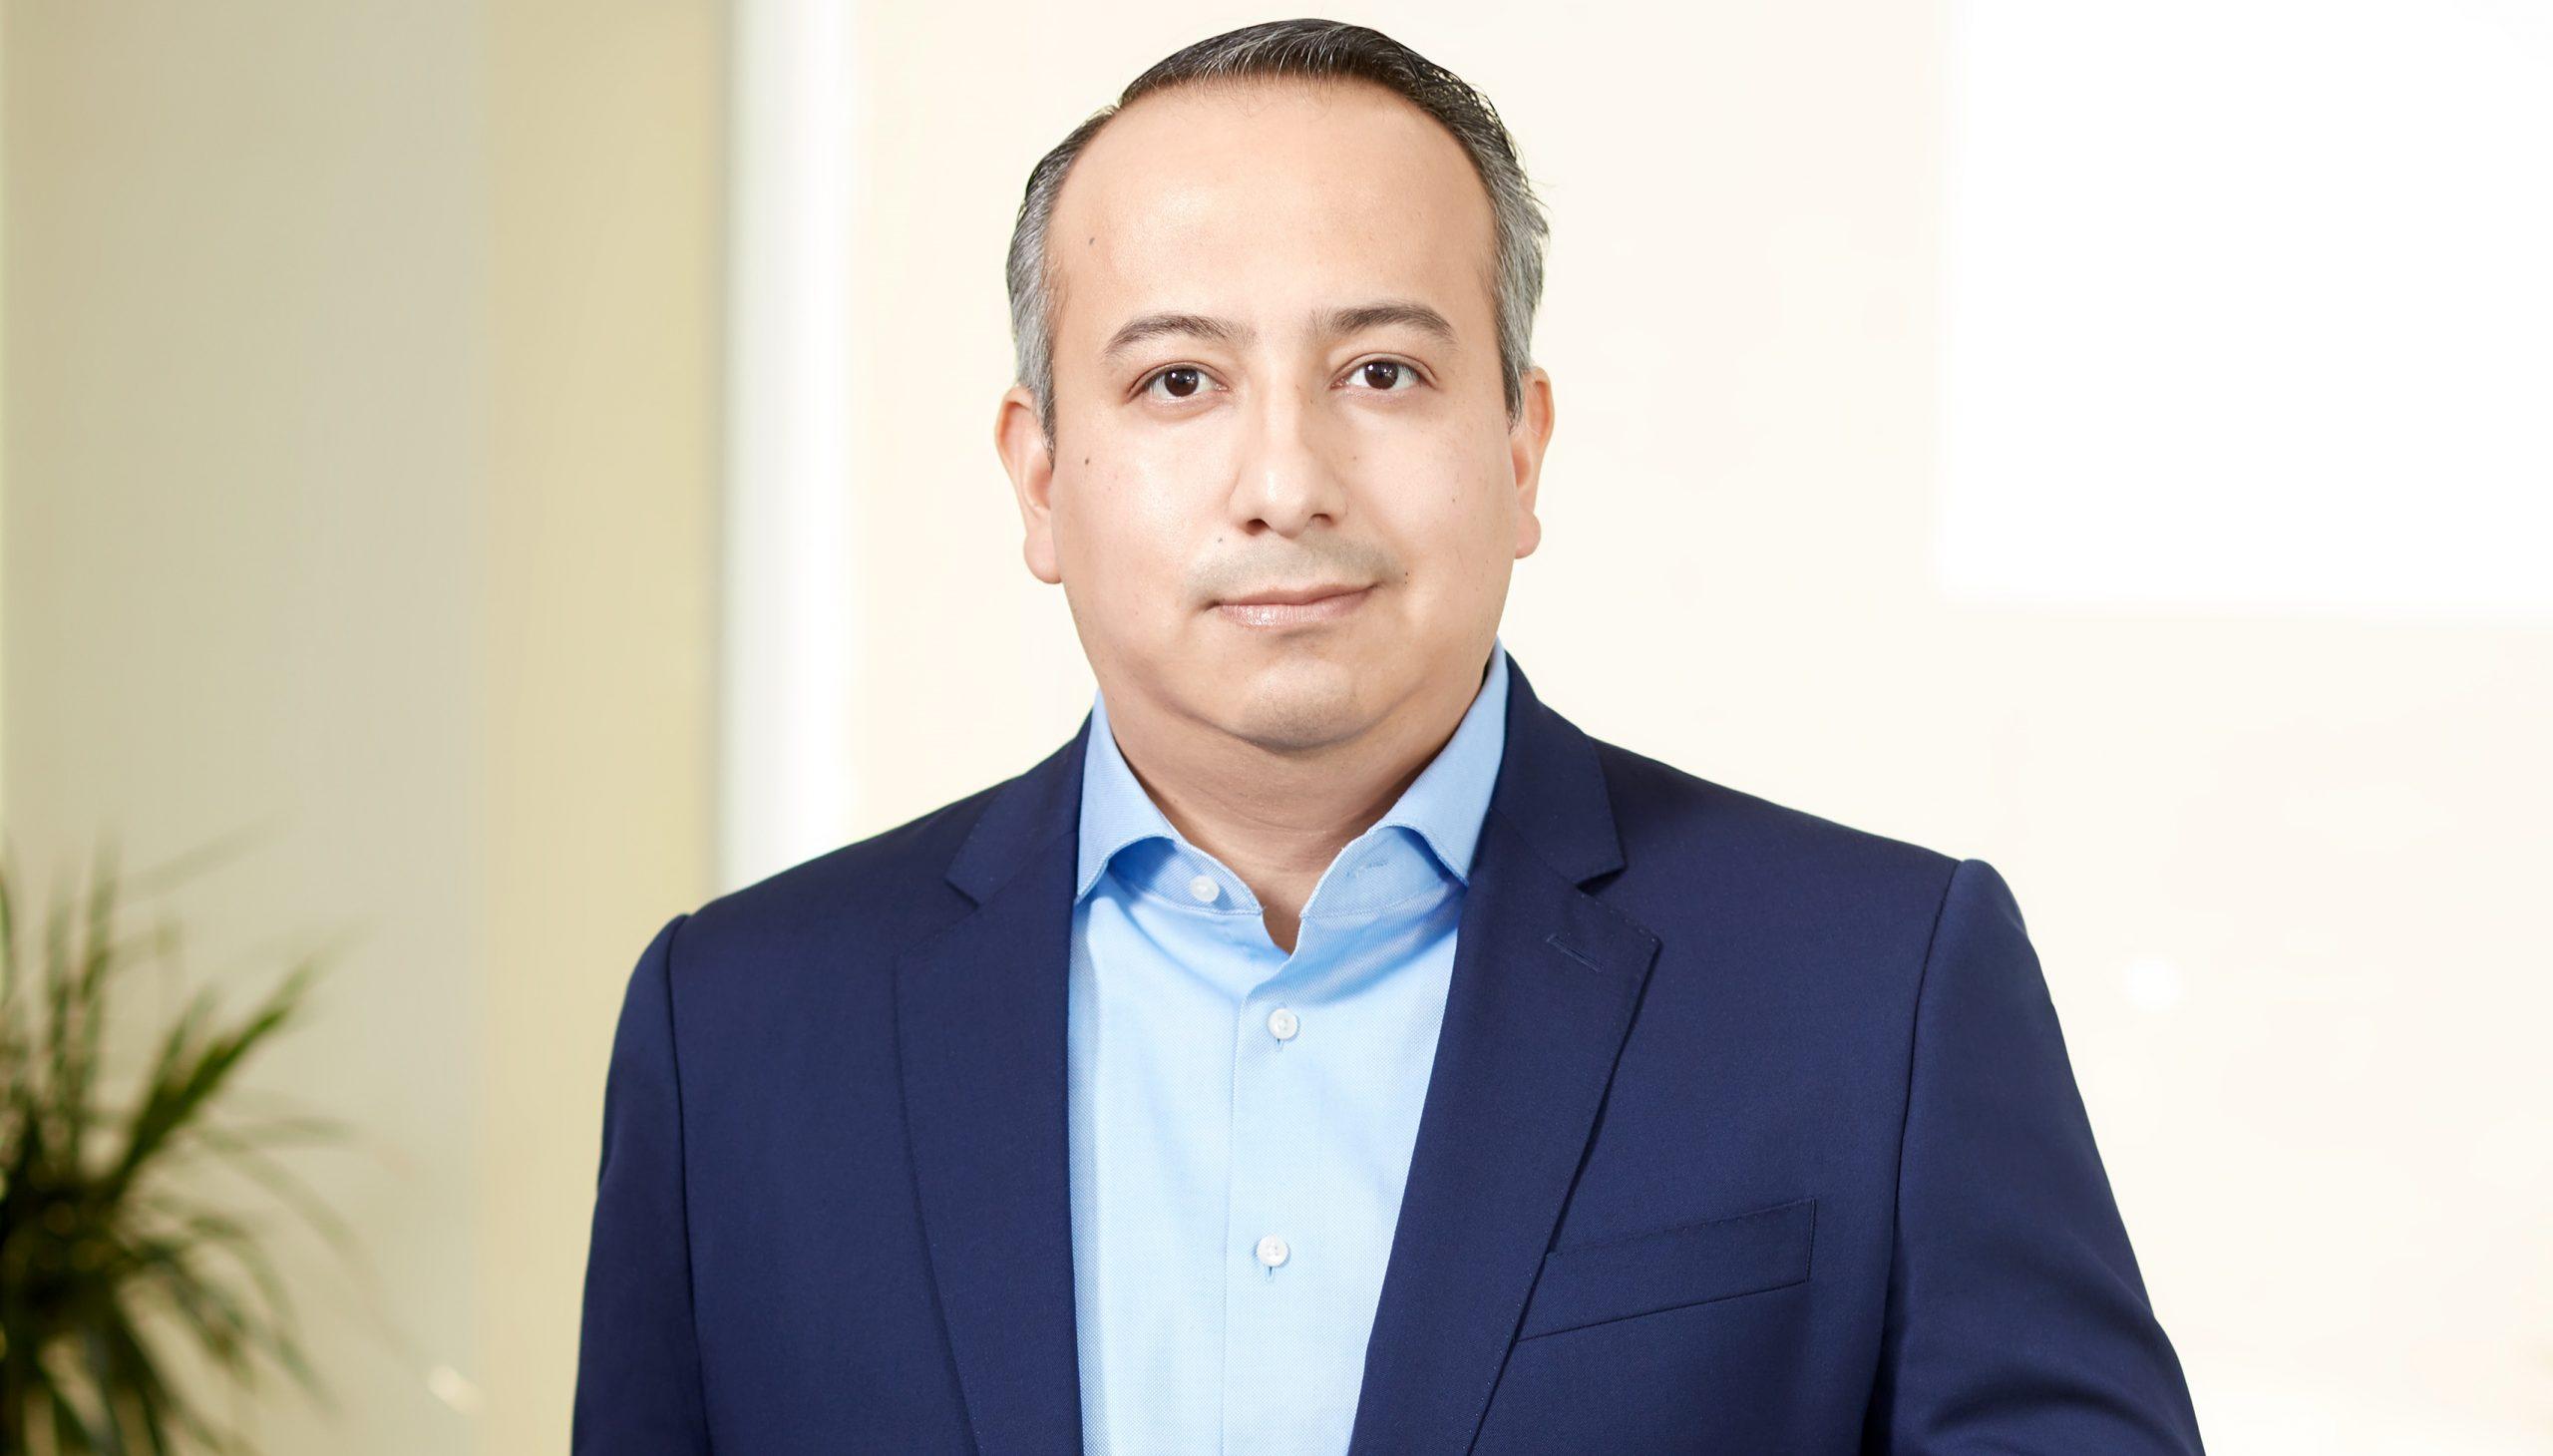 Manuel Ambriz, kommerciel direktør i Vueling. (Foto: Vueling | PR)